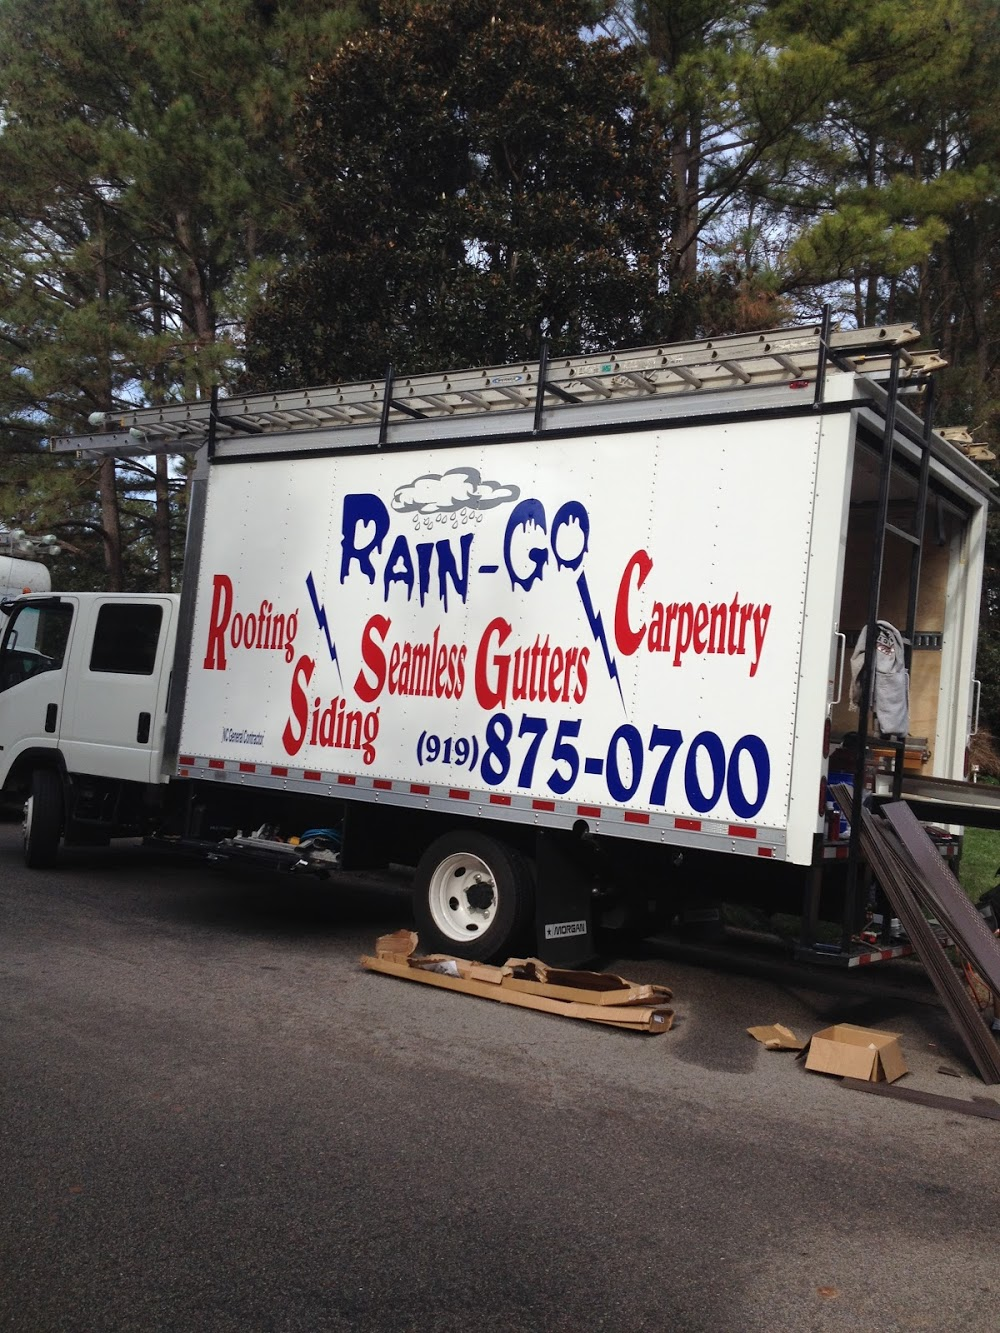 Rain-Go Exteriors & Roofing Company